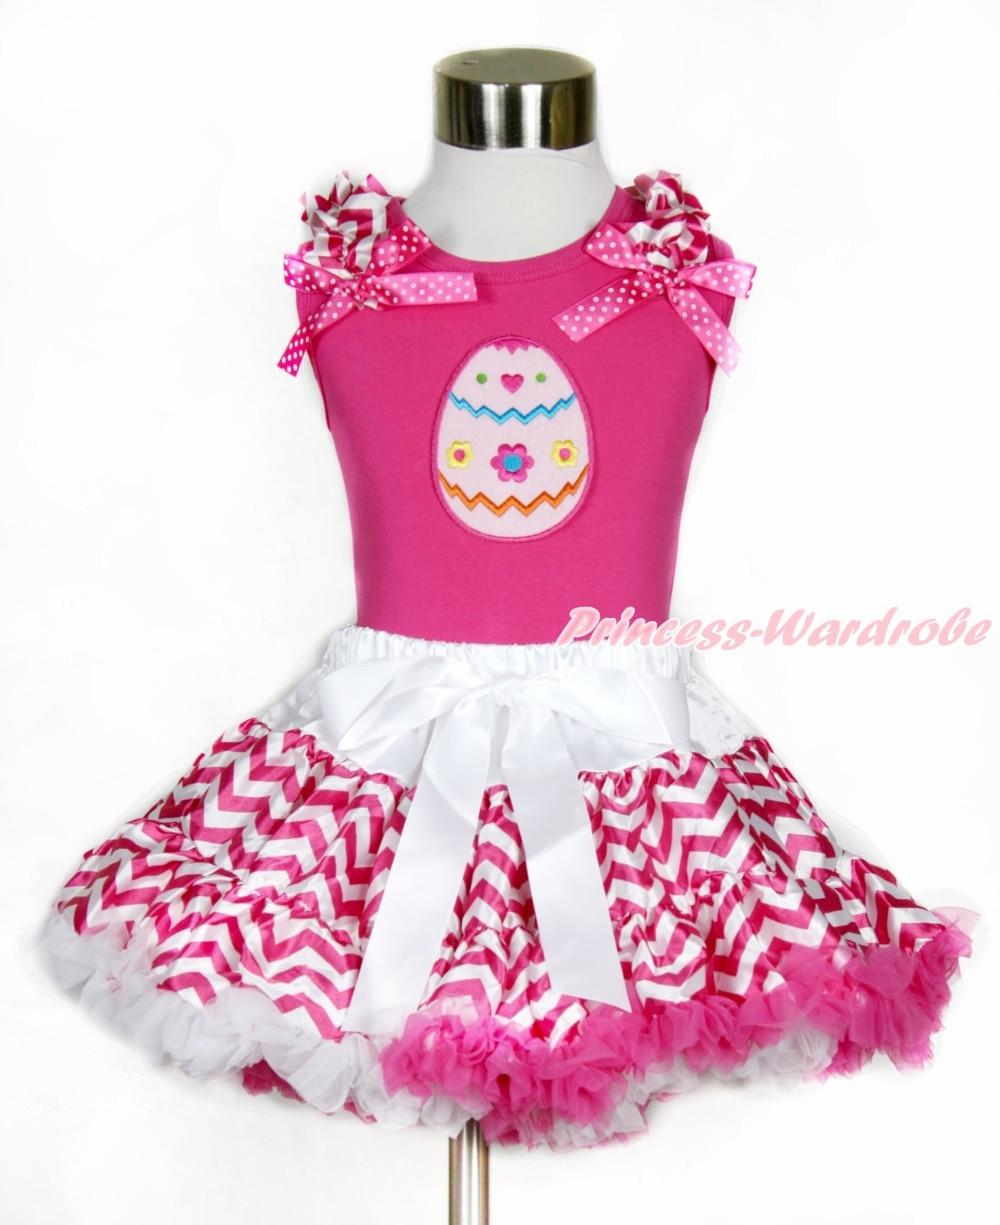 Hot Pink Tank Top, Hot Pink White Wave Ruffles Hot Pink White Dot Bow, Easter Egg Print,  Hot Pink White Wave Pettiskirt MAMH144<br>